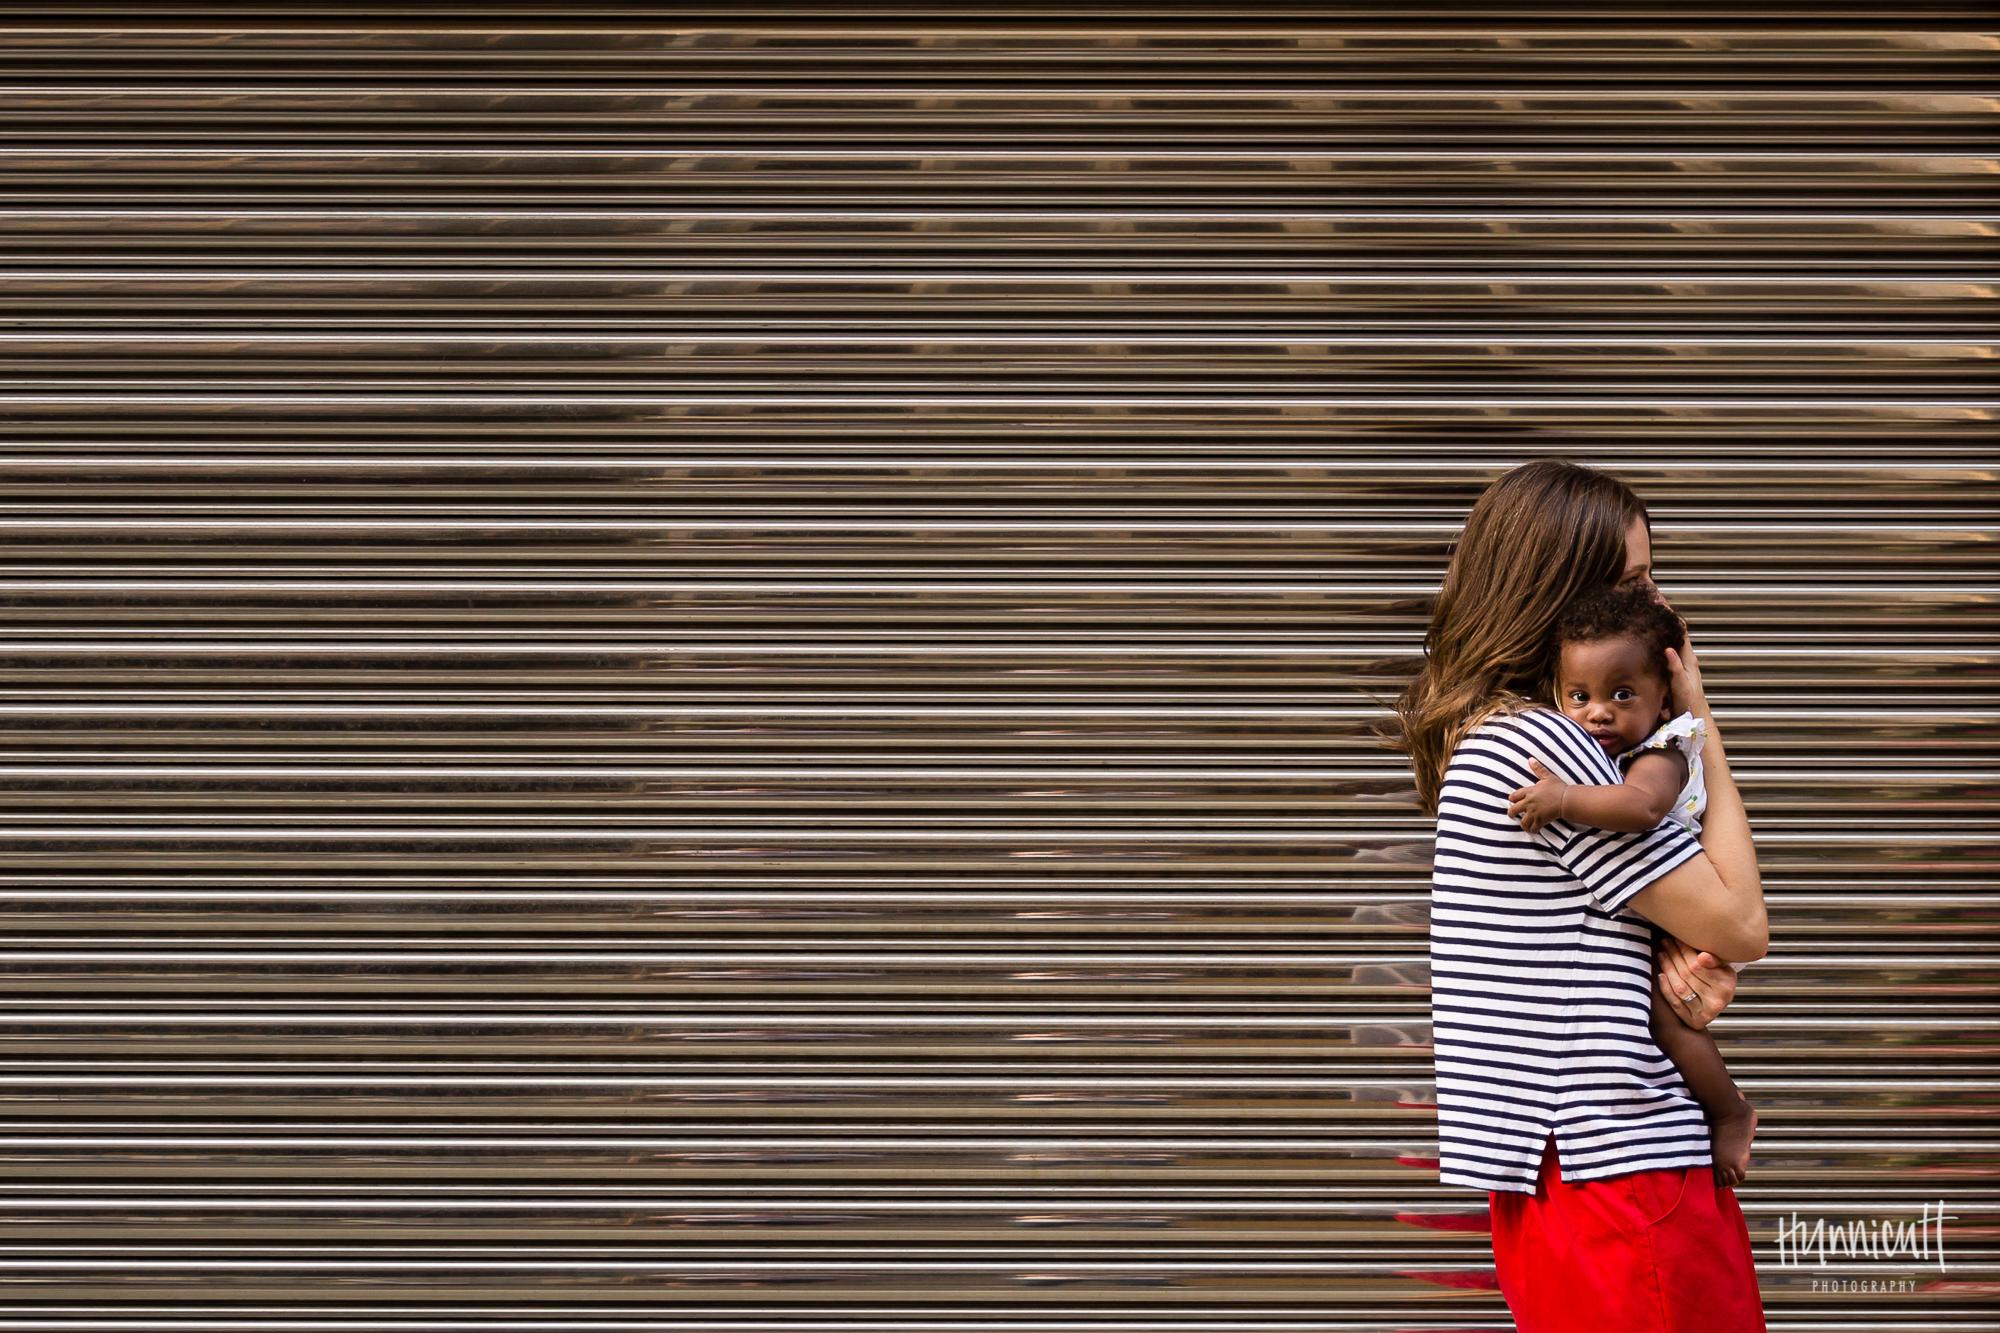 Hunnicutt_Photography_Taichung_Urban_Lifestyle_Family_Photography_indoor_outdoor_rebecca_hunnicutt_farren_adoption-23